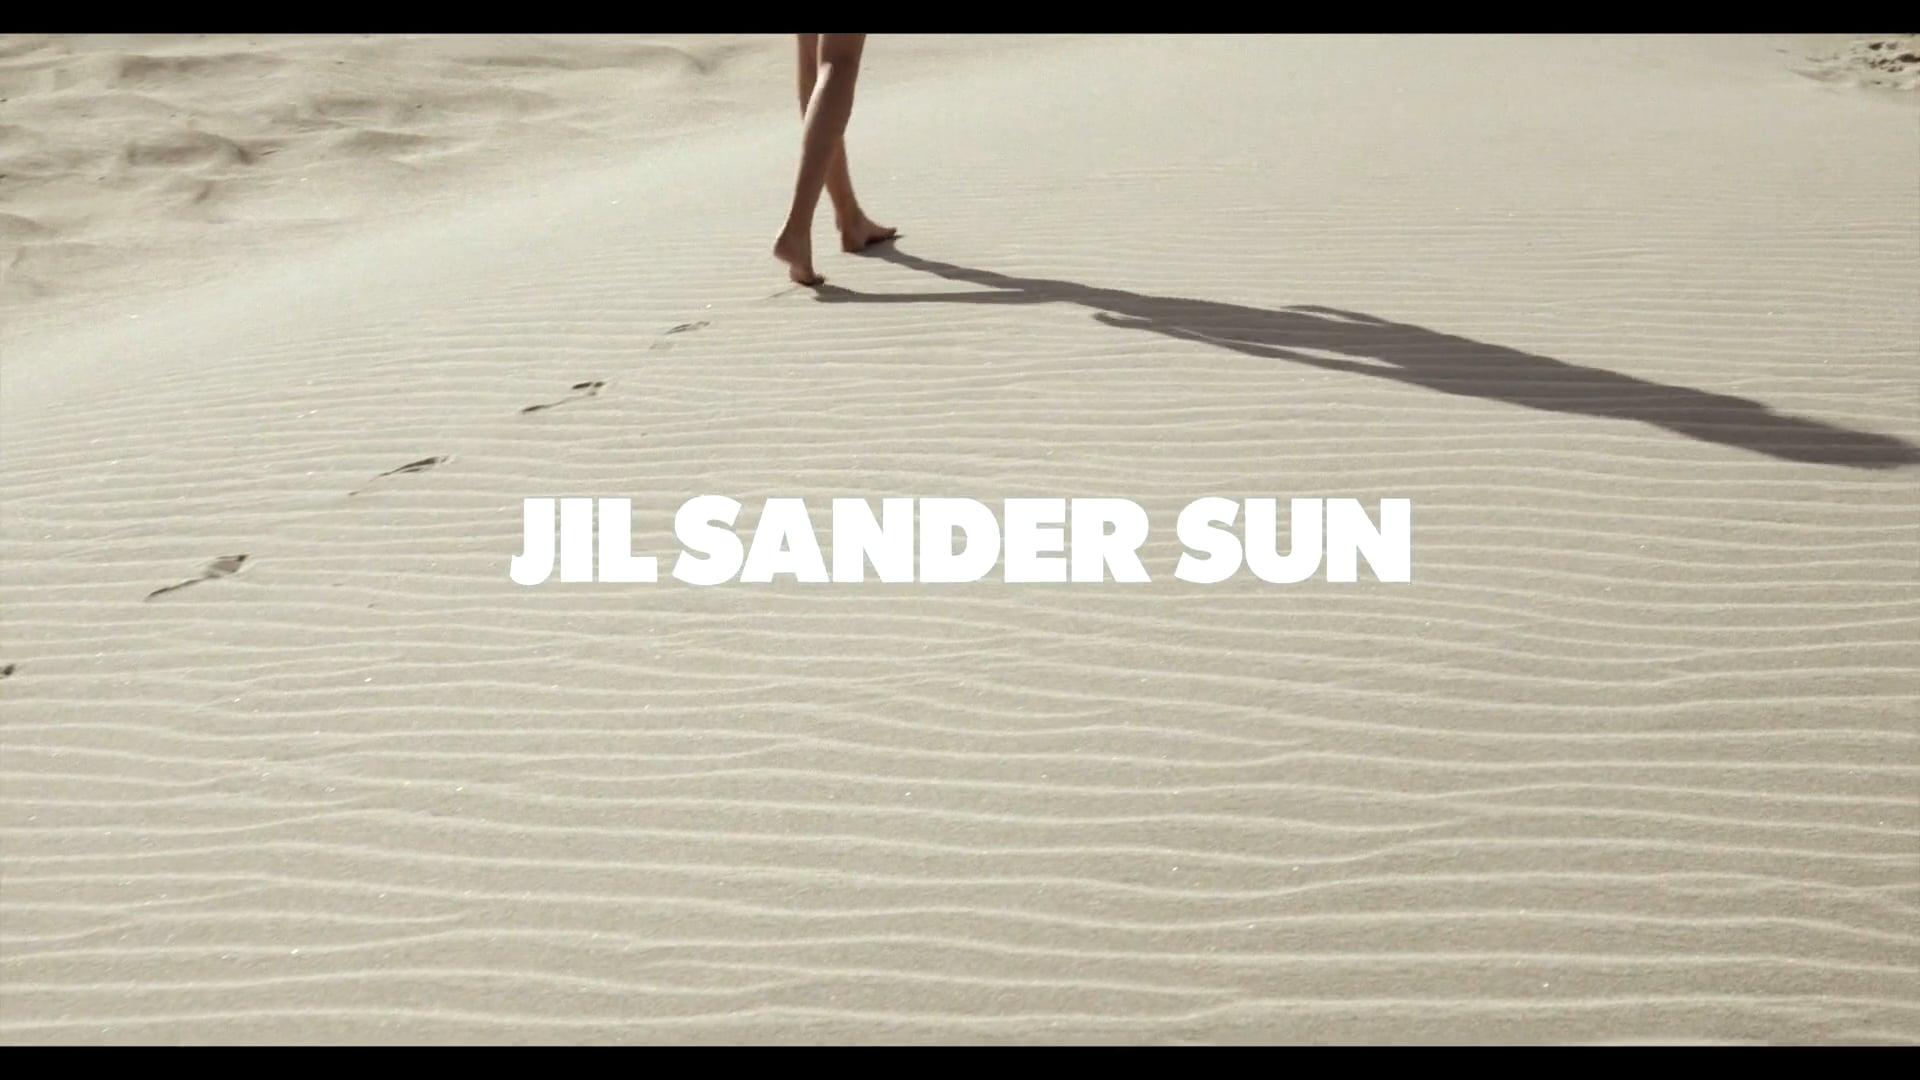 JIL SANDER MOOD FILM 2BD(30 S)